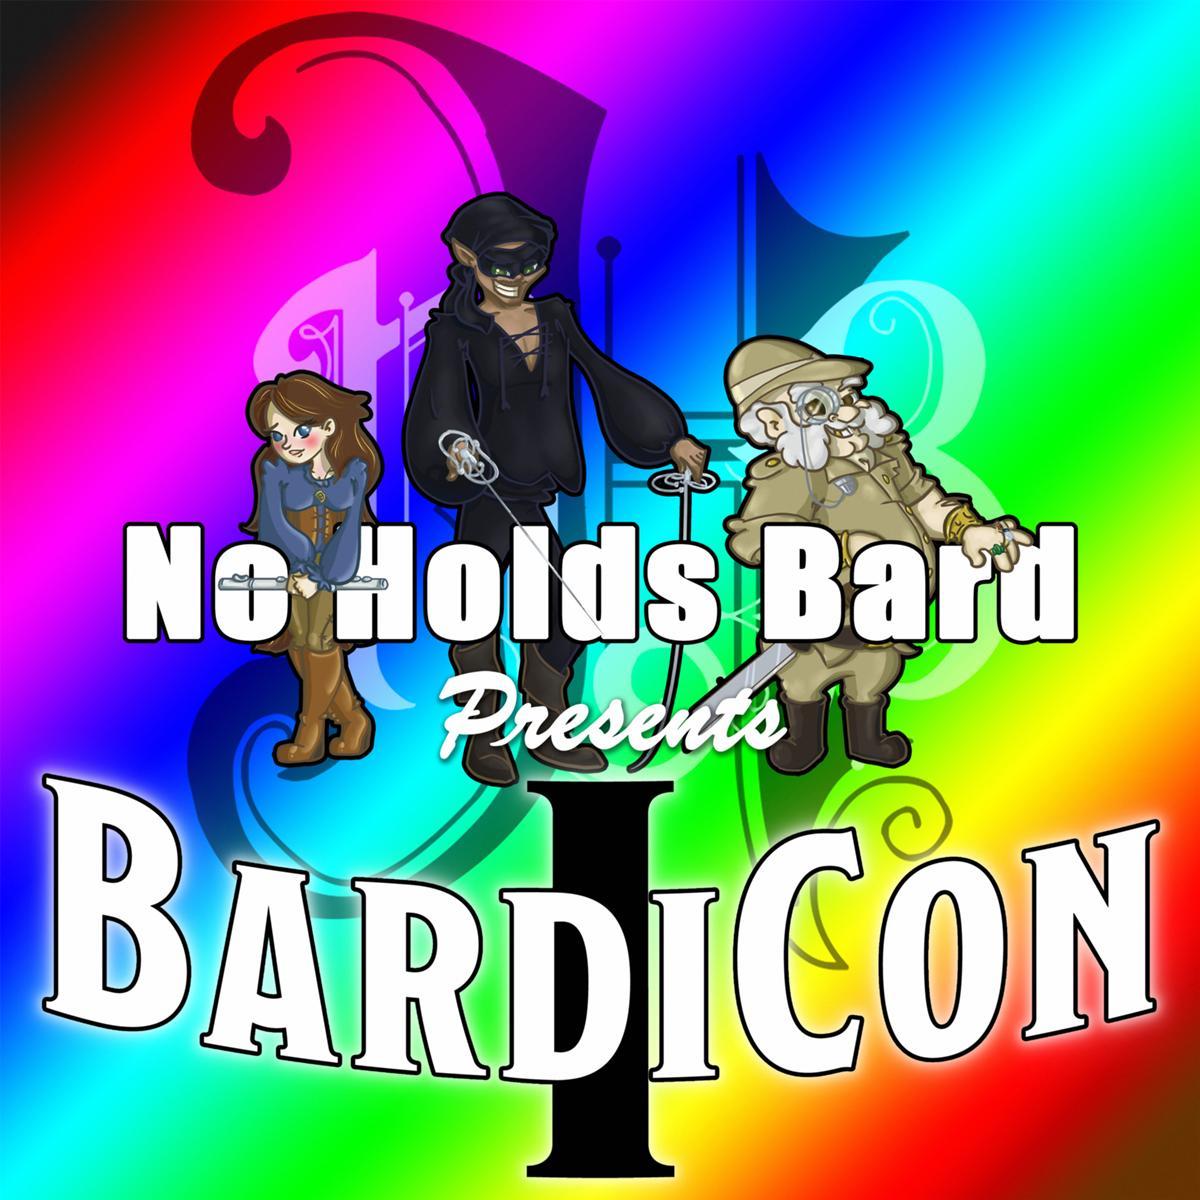 BardiCon-I-Nondiscrimination.jpg